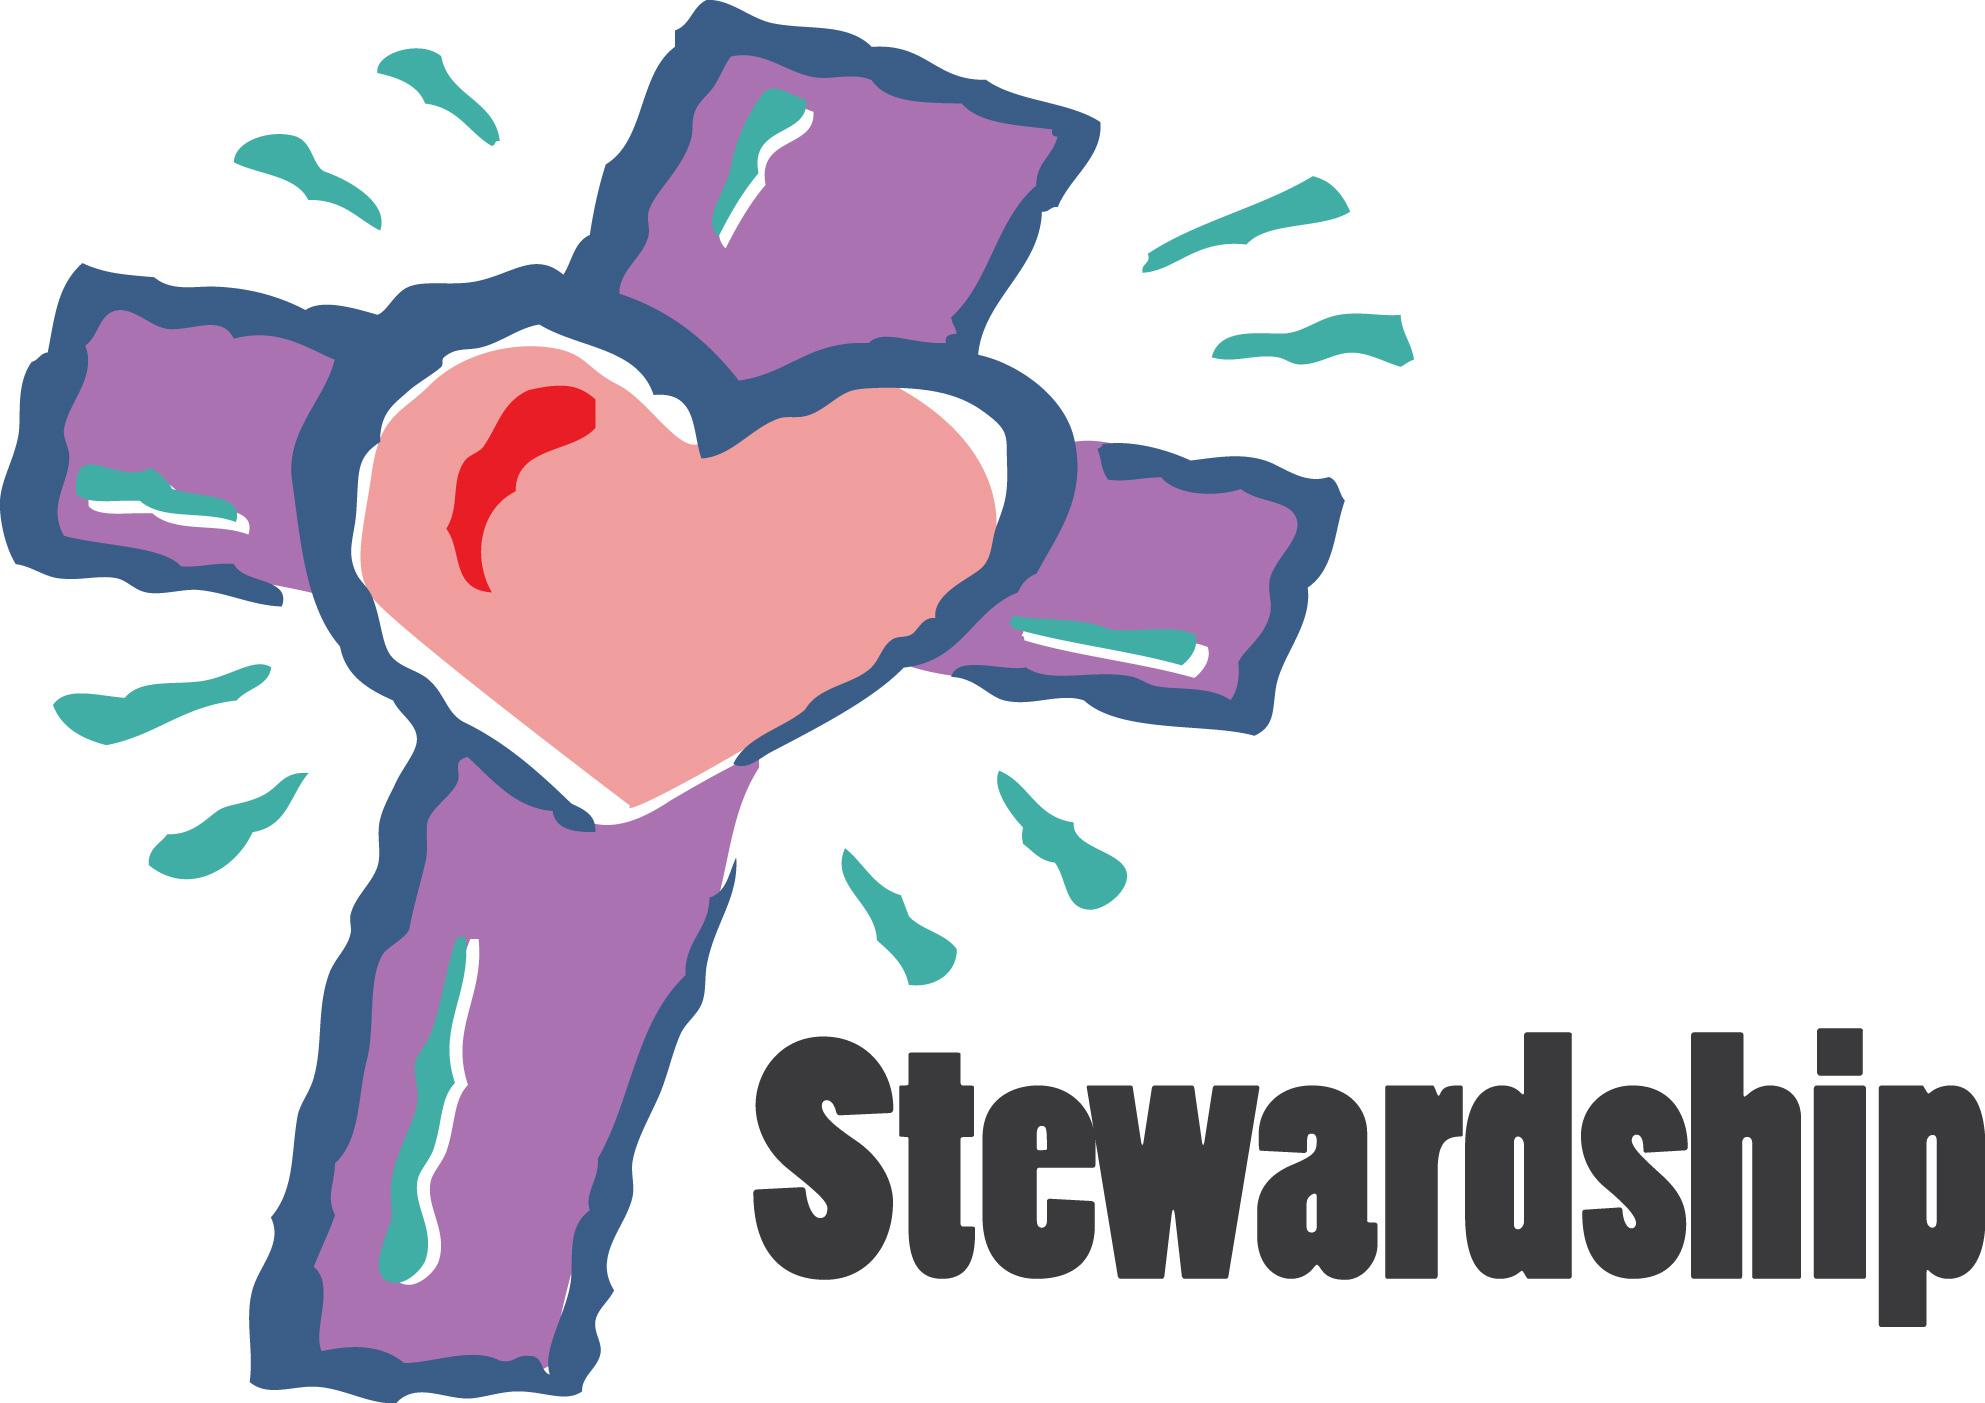 Stewardship Www Imgkid Com The Image Kid Has It